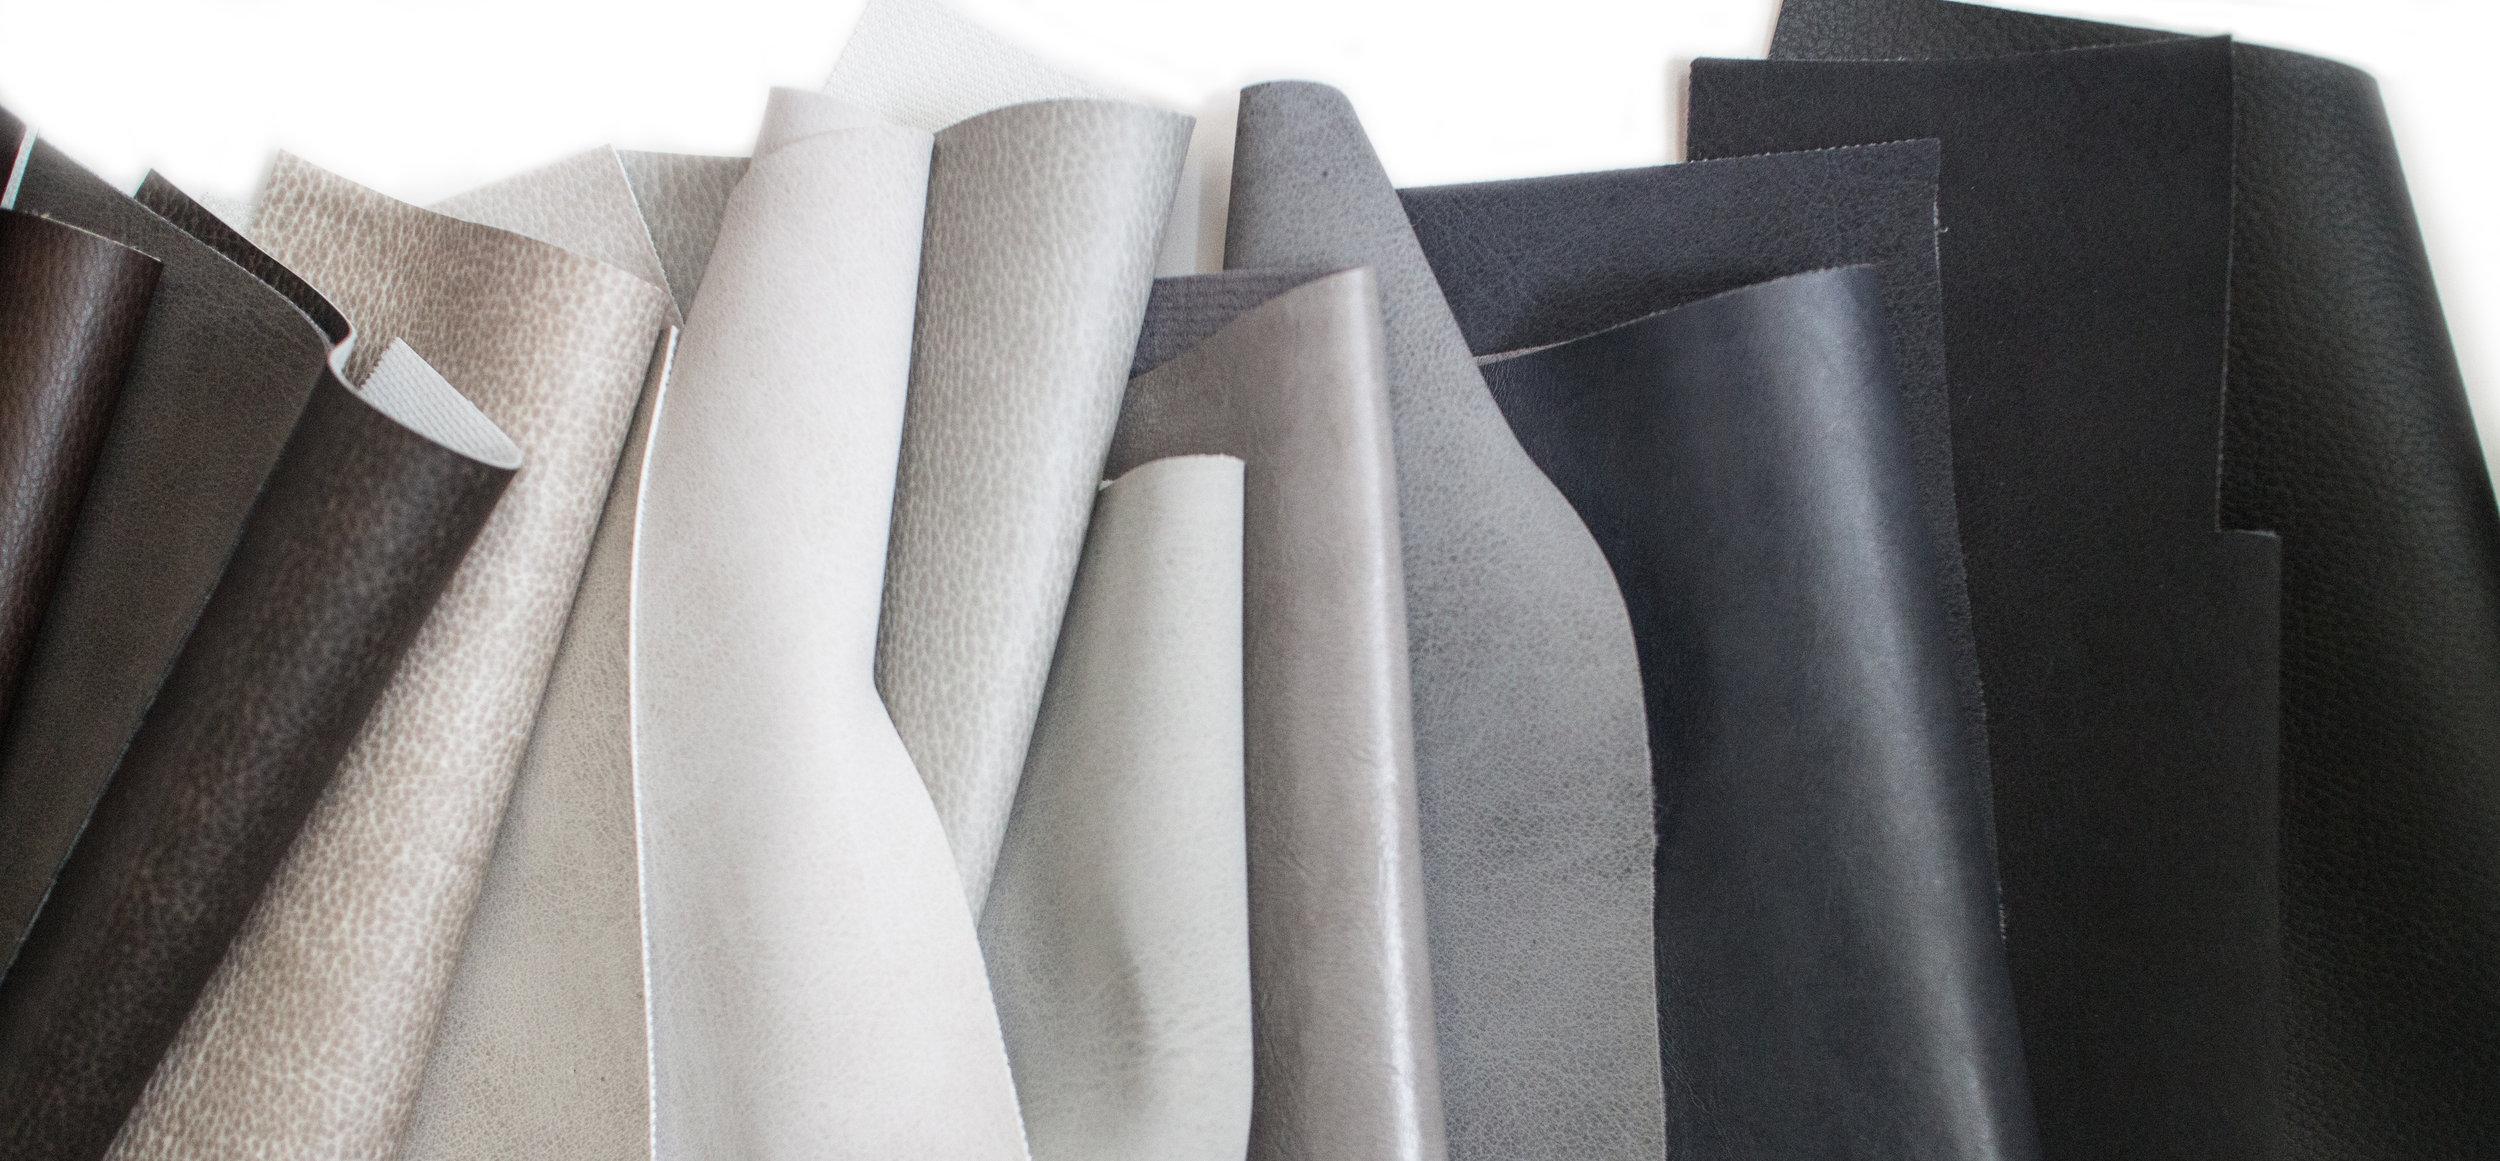 Fil Doux Textiles_4886.jpg